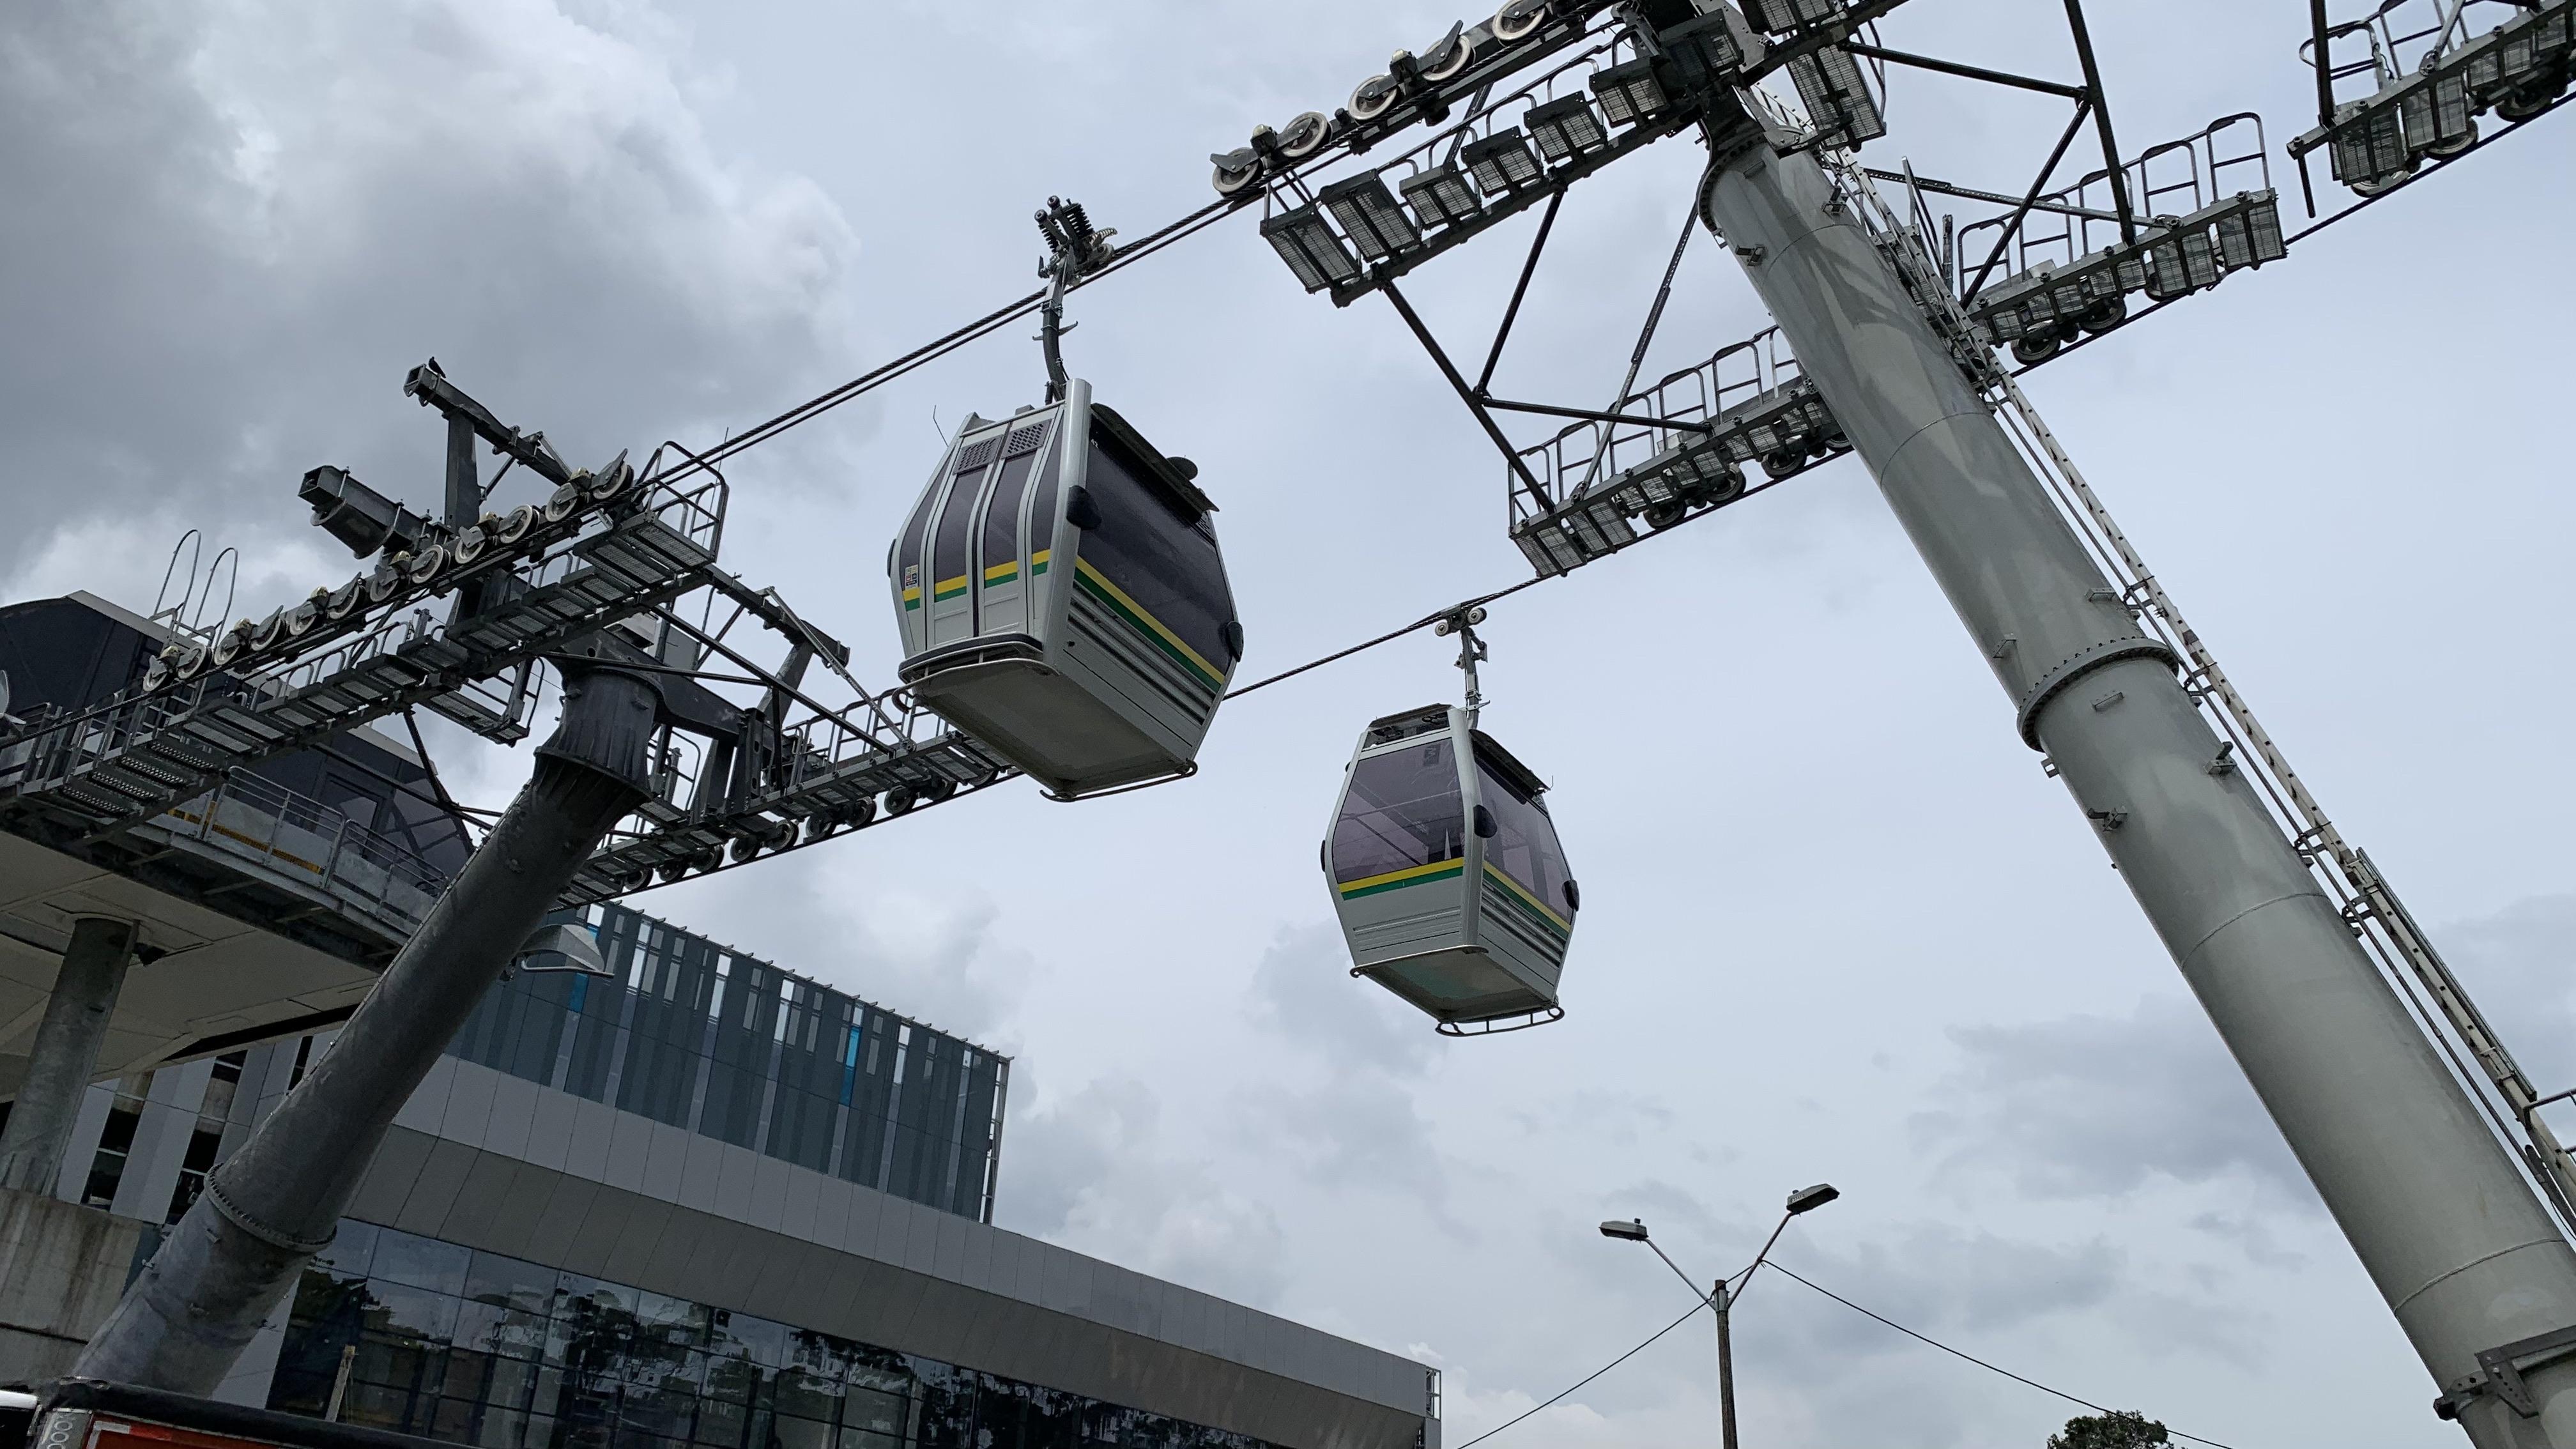 Transporte público de Medellín progresa pese a oportunidades desaprovechadas